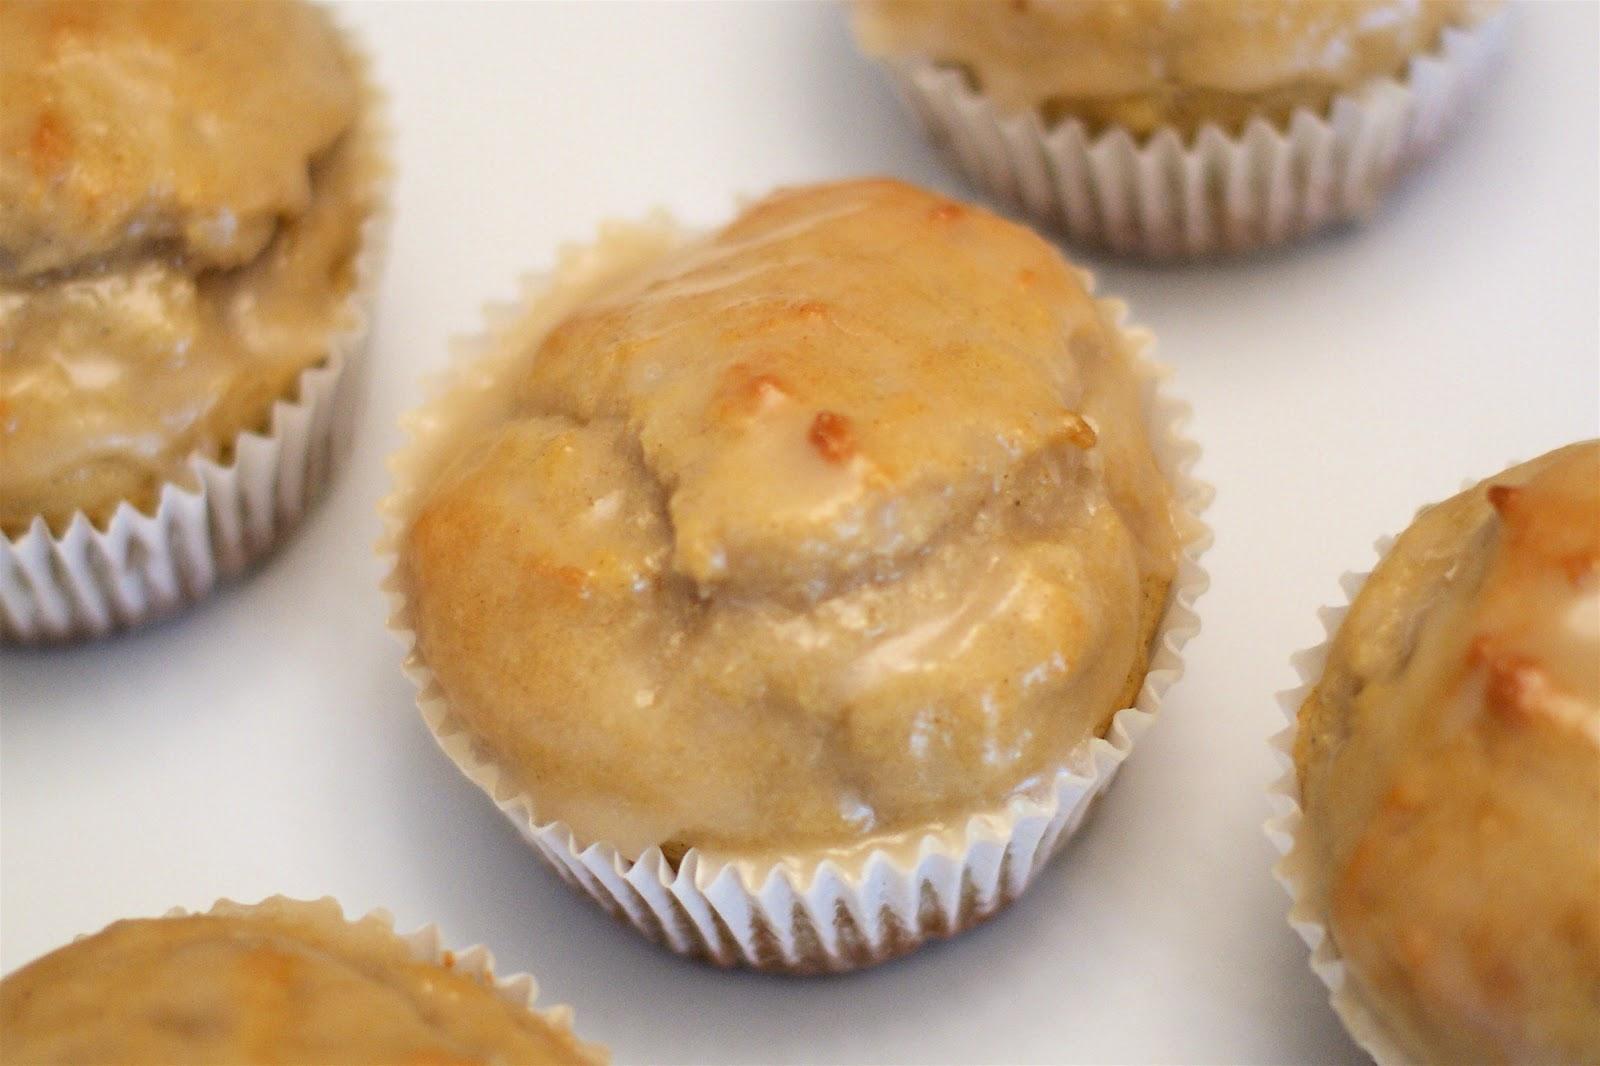 Sarah Bakes Gluten Free Treats: gluten free glazed donut muffins